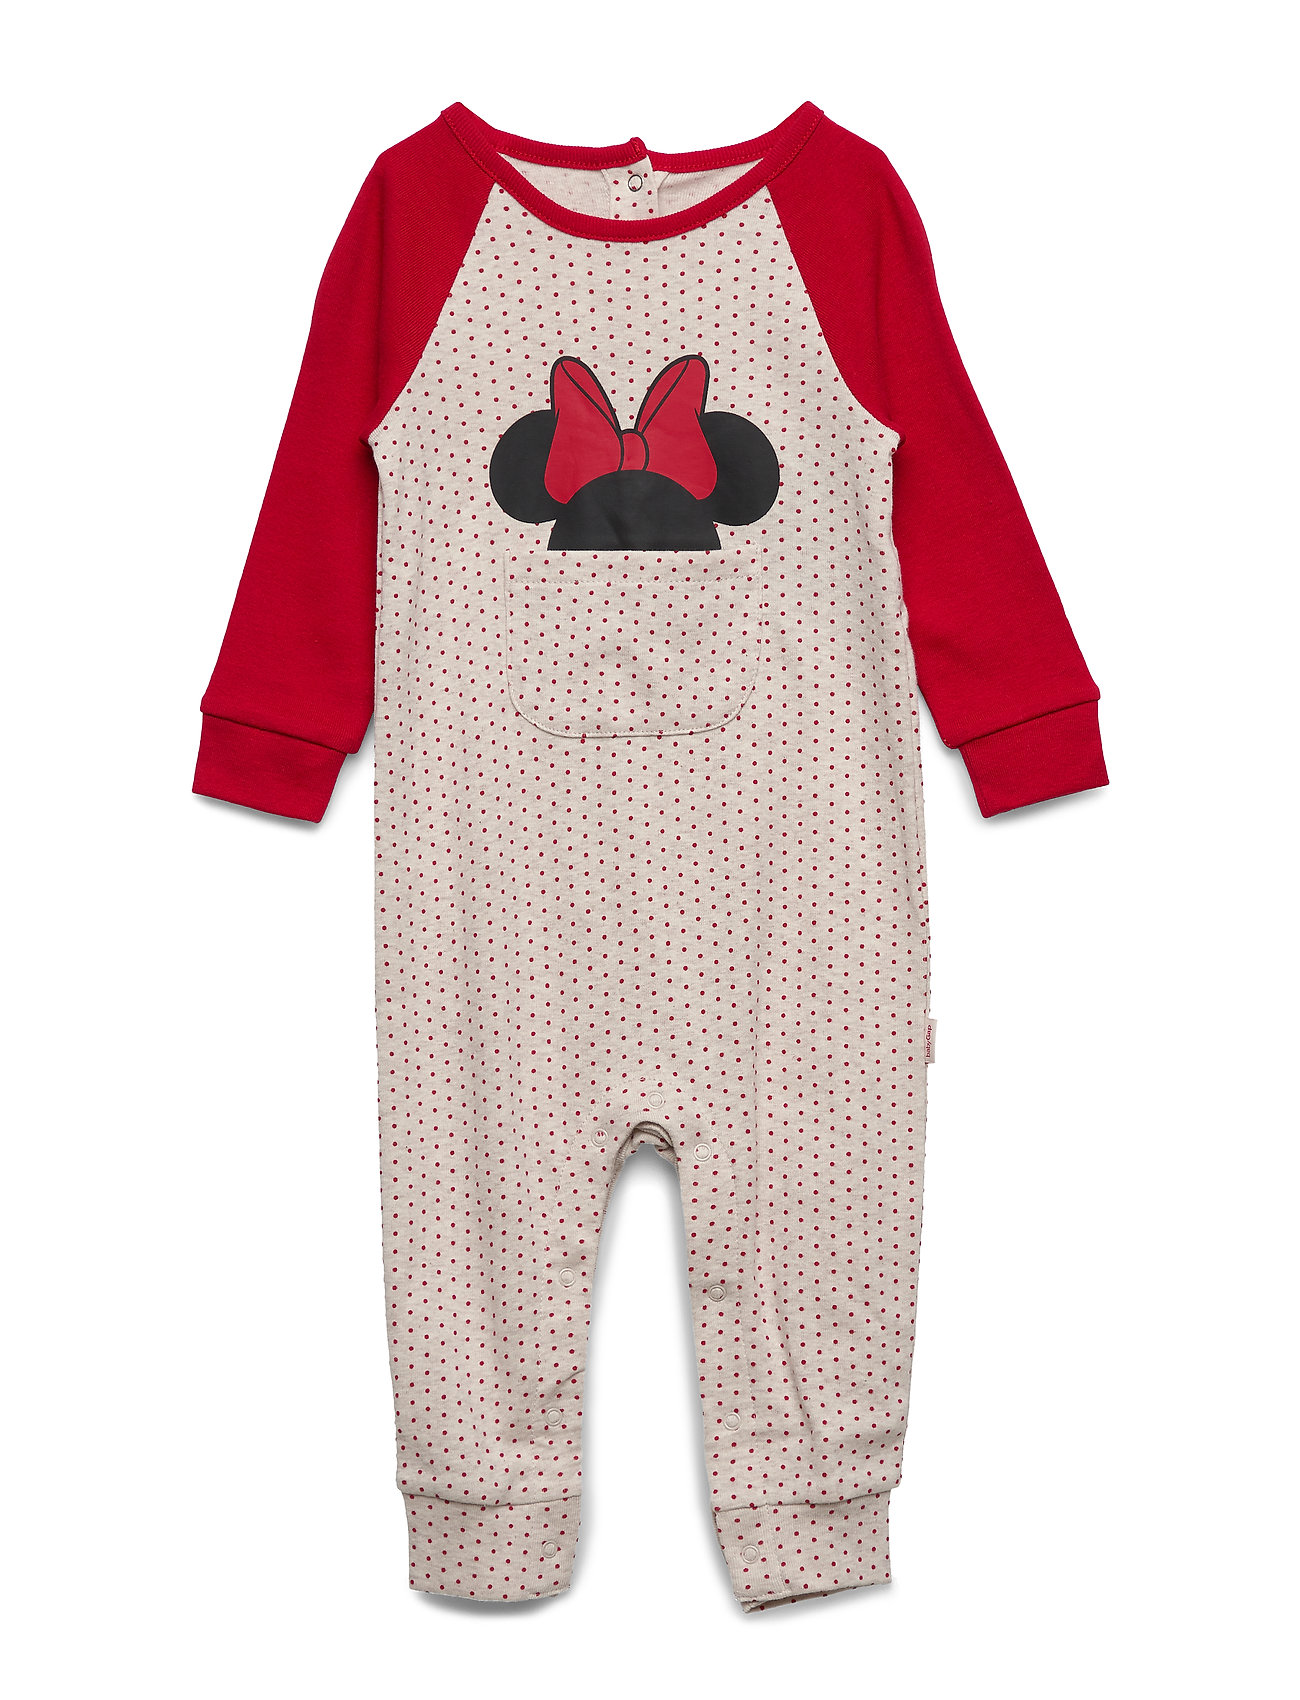 GAP babyGap | Disney Minnie Mouse One-Piece - OATMEAL HEATHER B0281